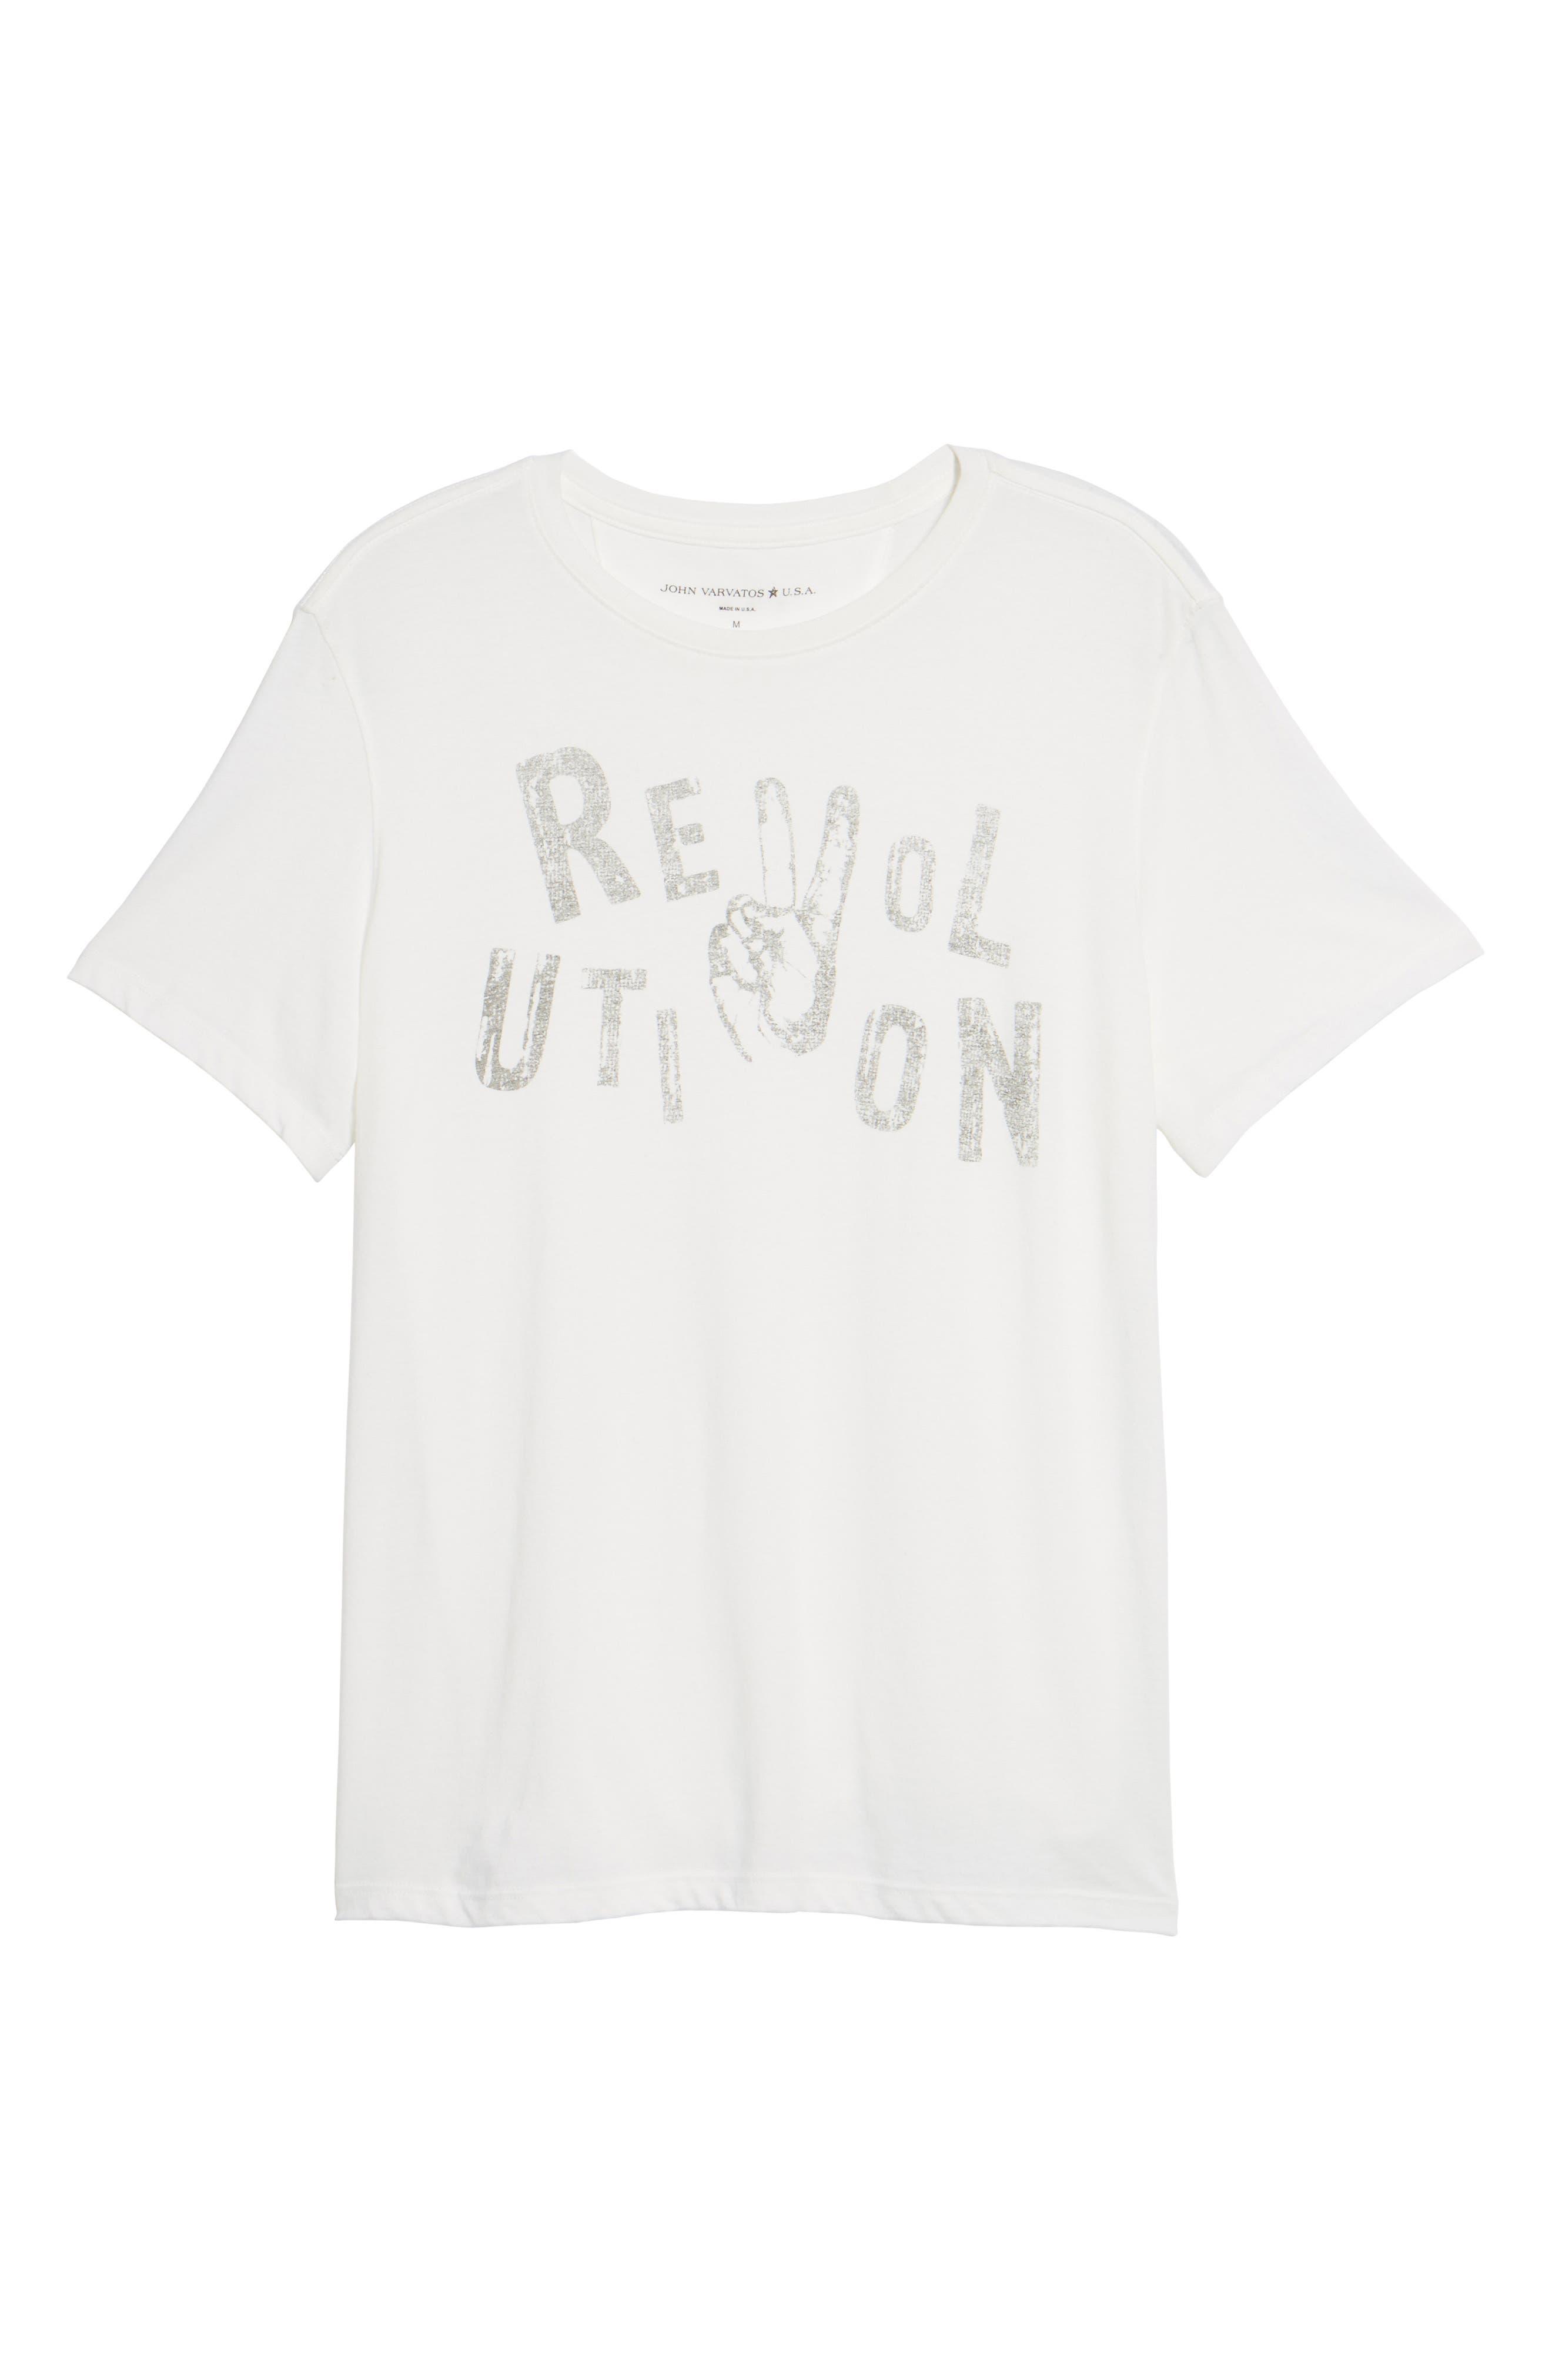 Revolution Graphic T-Shirt,                             Alternate thumbnail 6, color,                             103